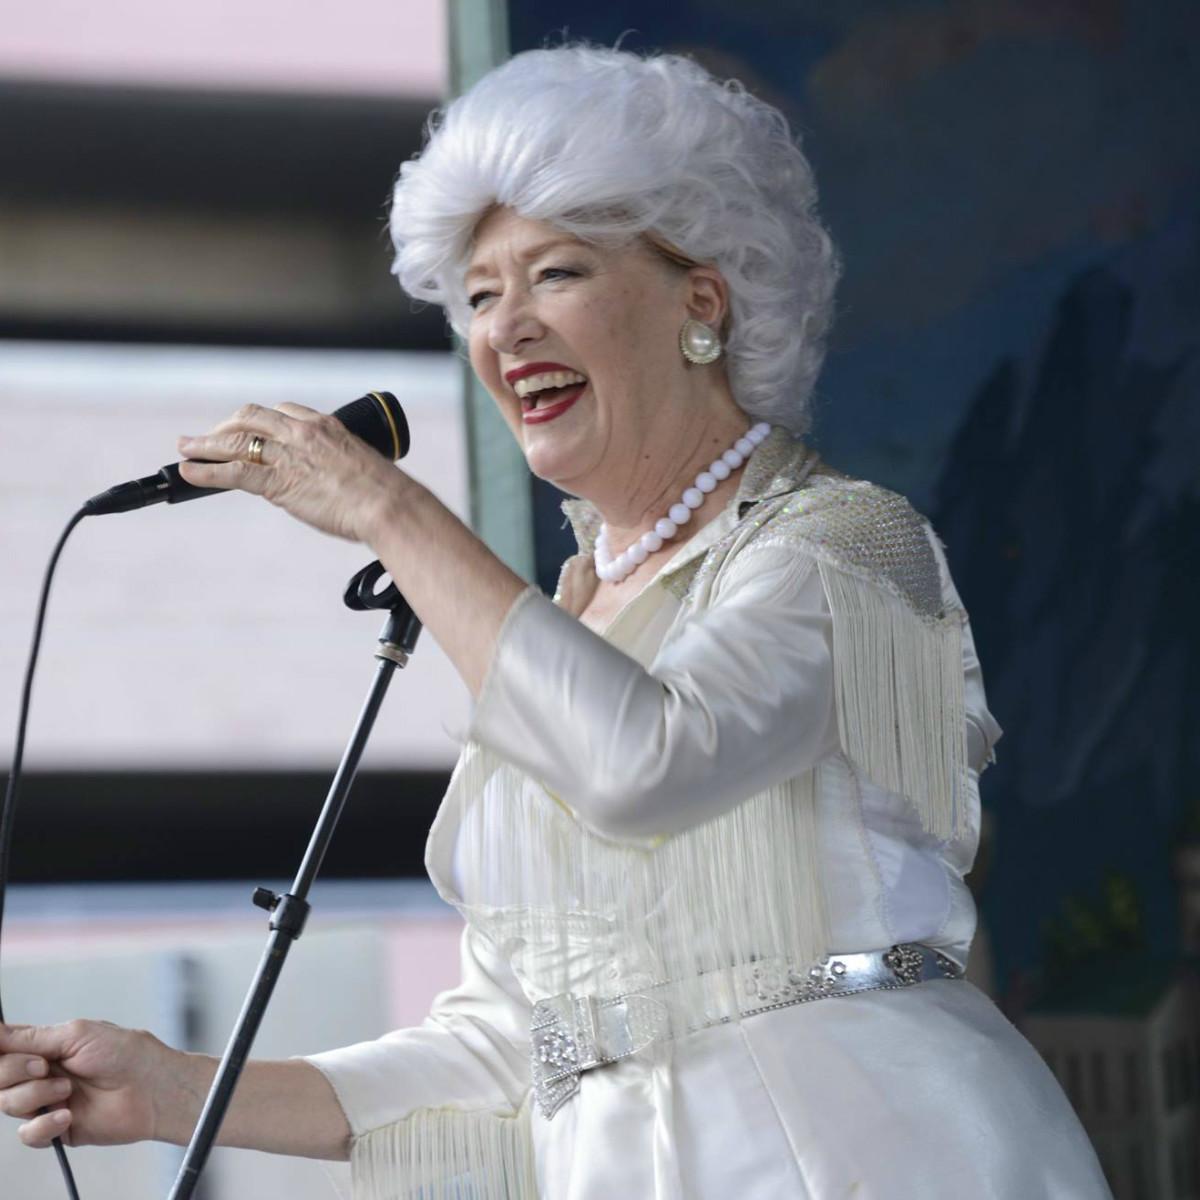 Shannon Sedwick Austin comedian Ann Richards costume 2014